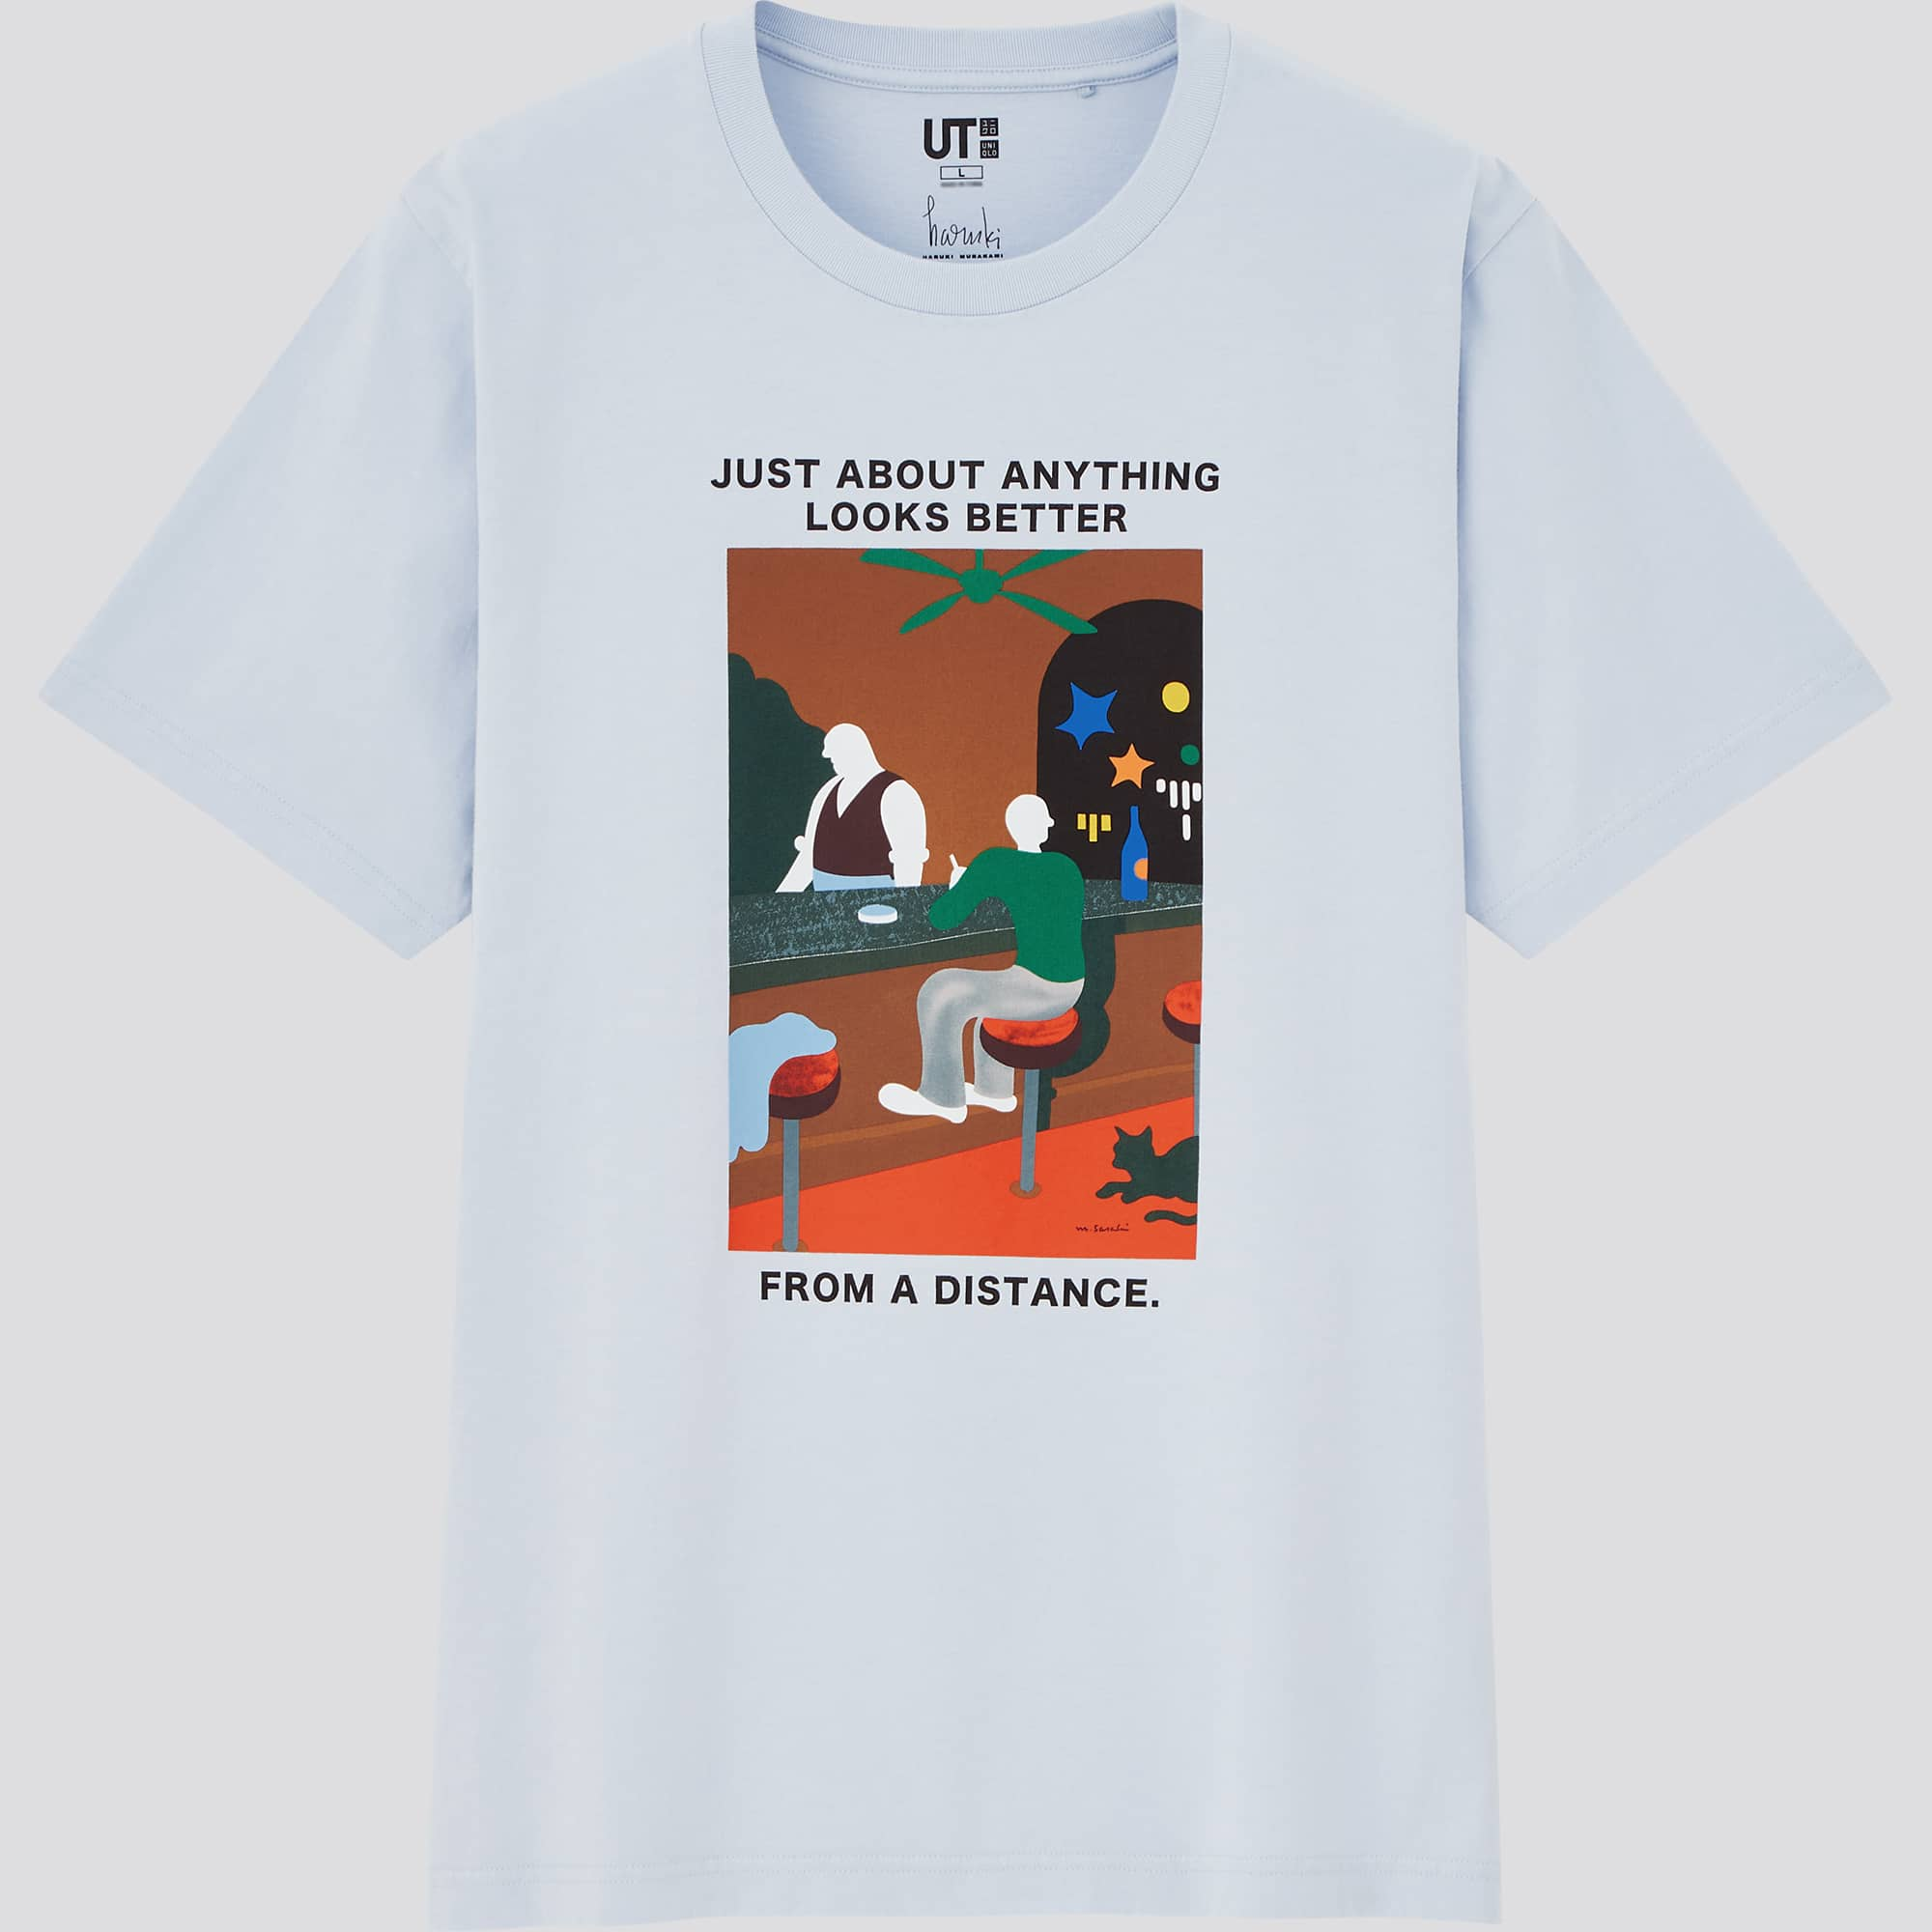 Uniqlo brings the creative world of Haruki Murakami to its new UT collection 16